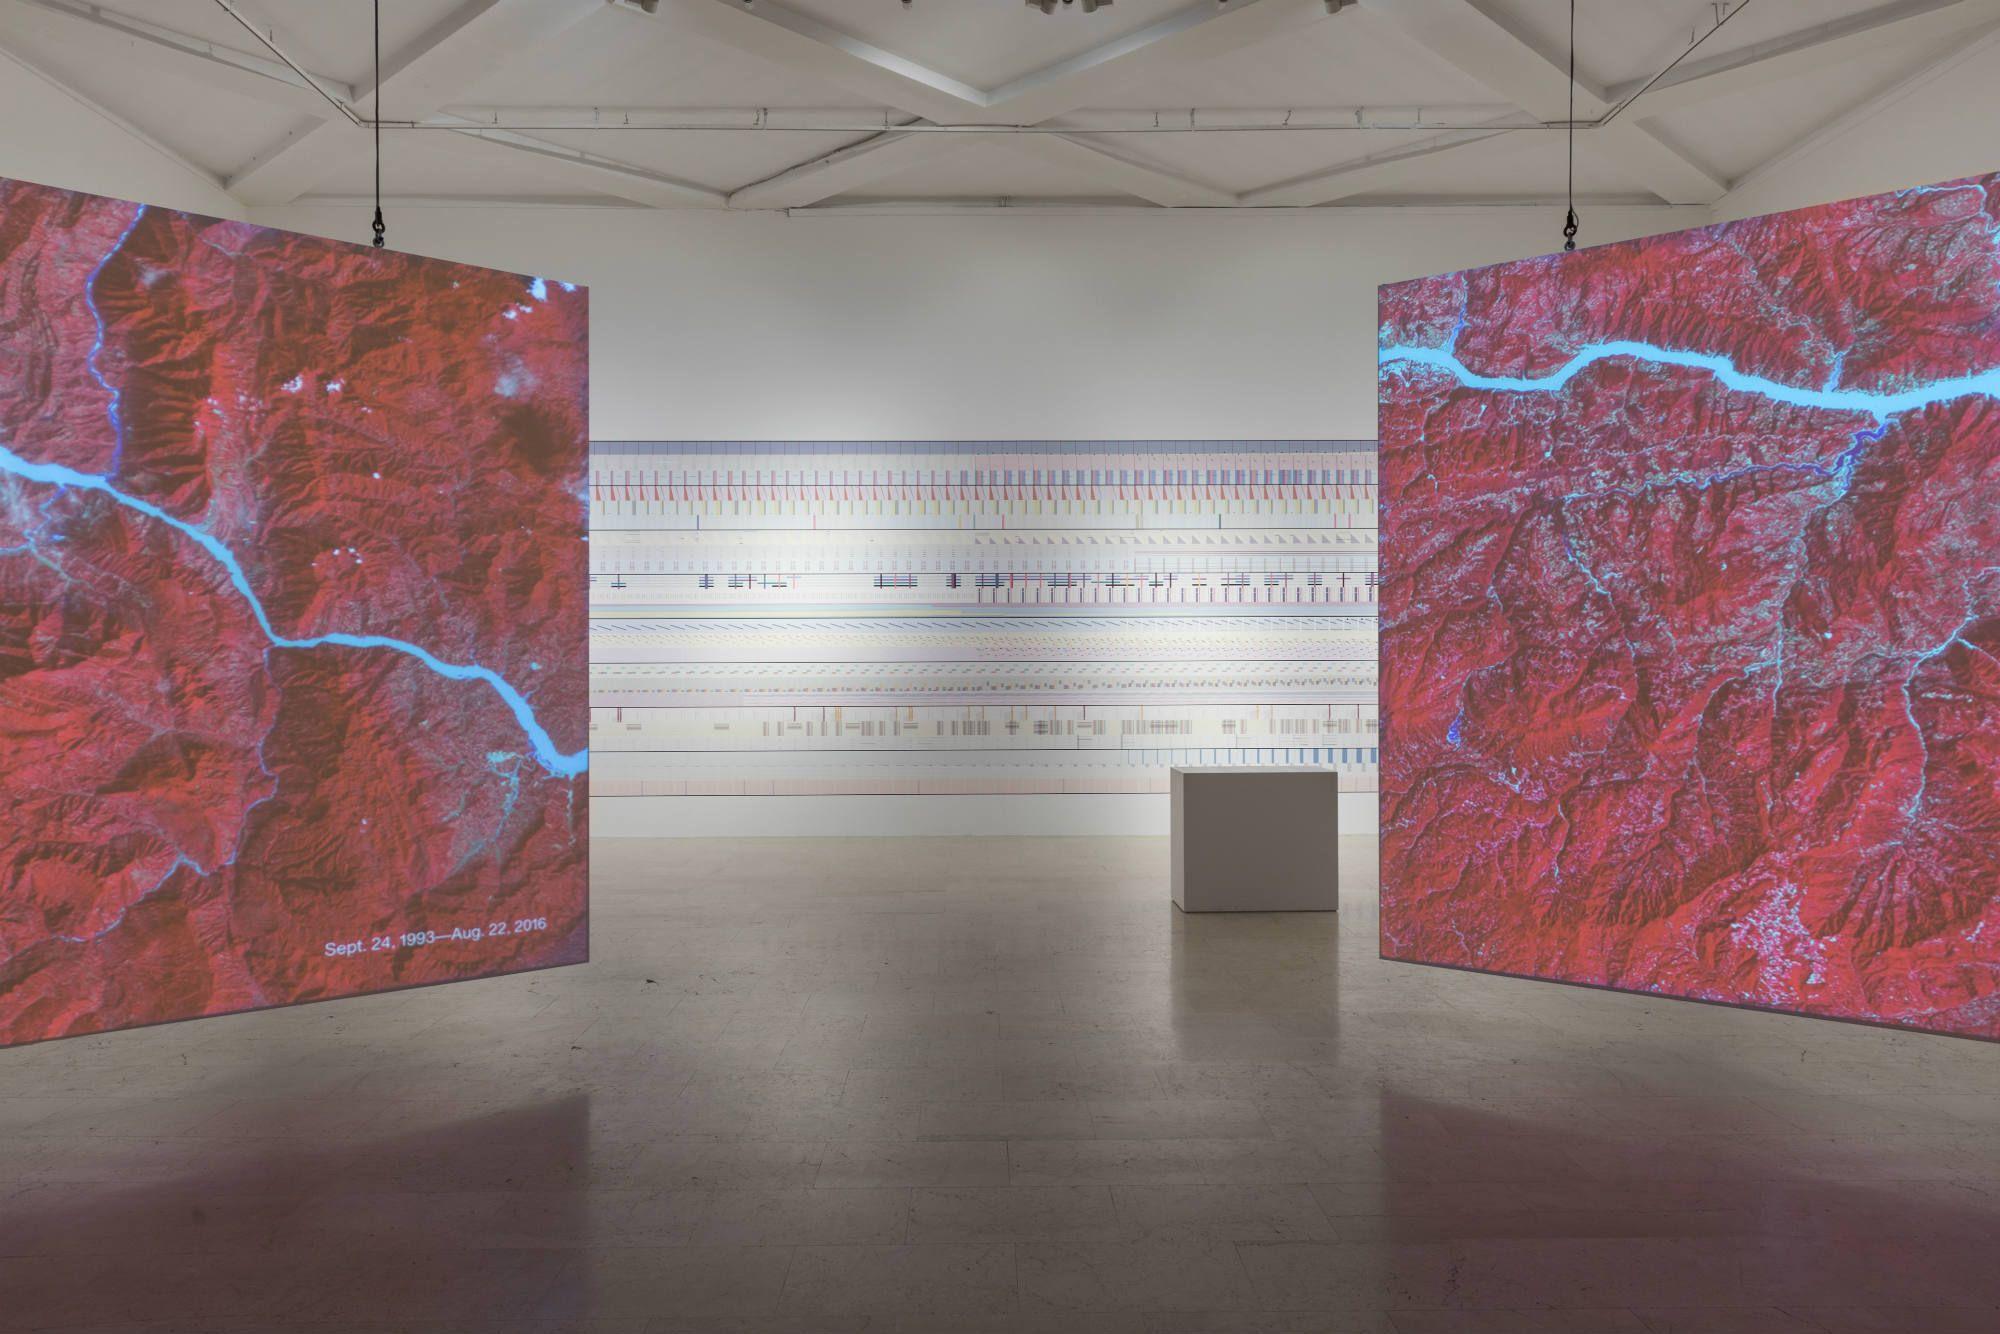 Broken Nature, a guide to the XXII Triennale di Milano